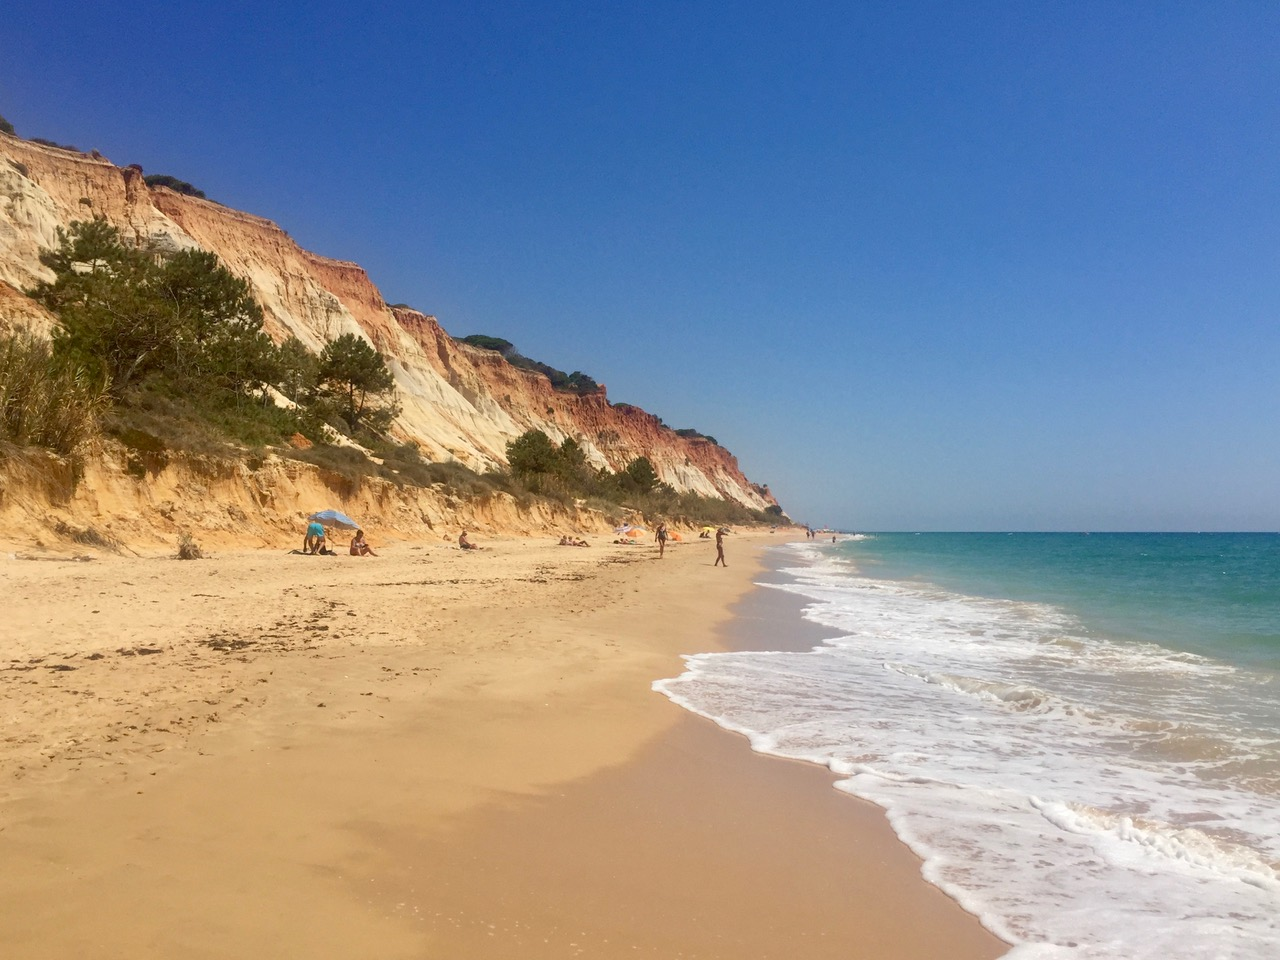 Pine Cliffs Beaches, Algarve, Portugal